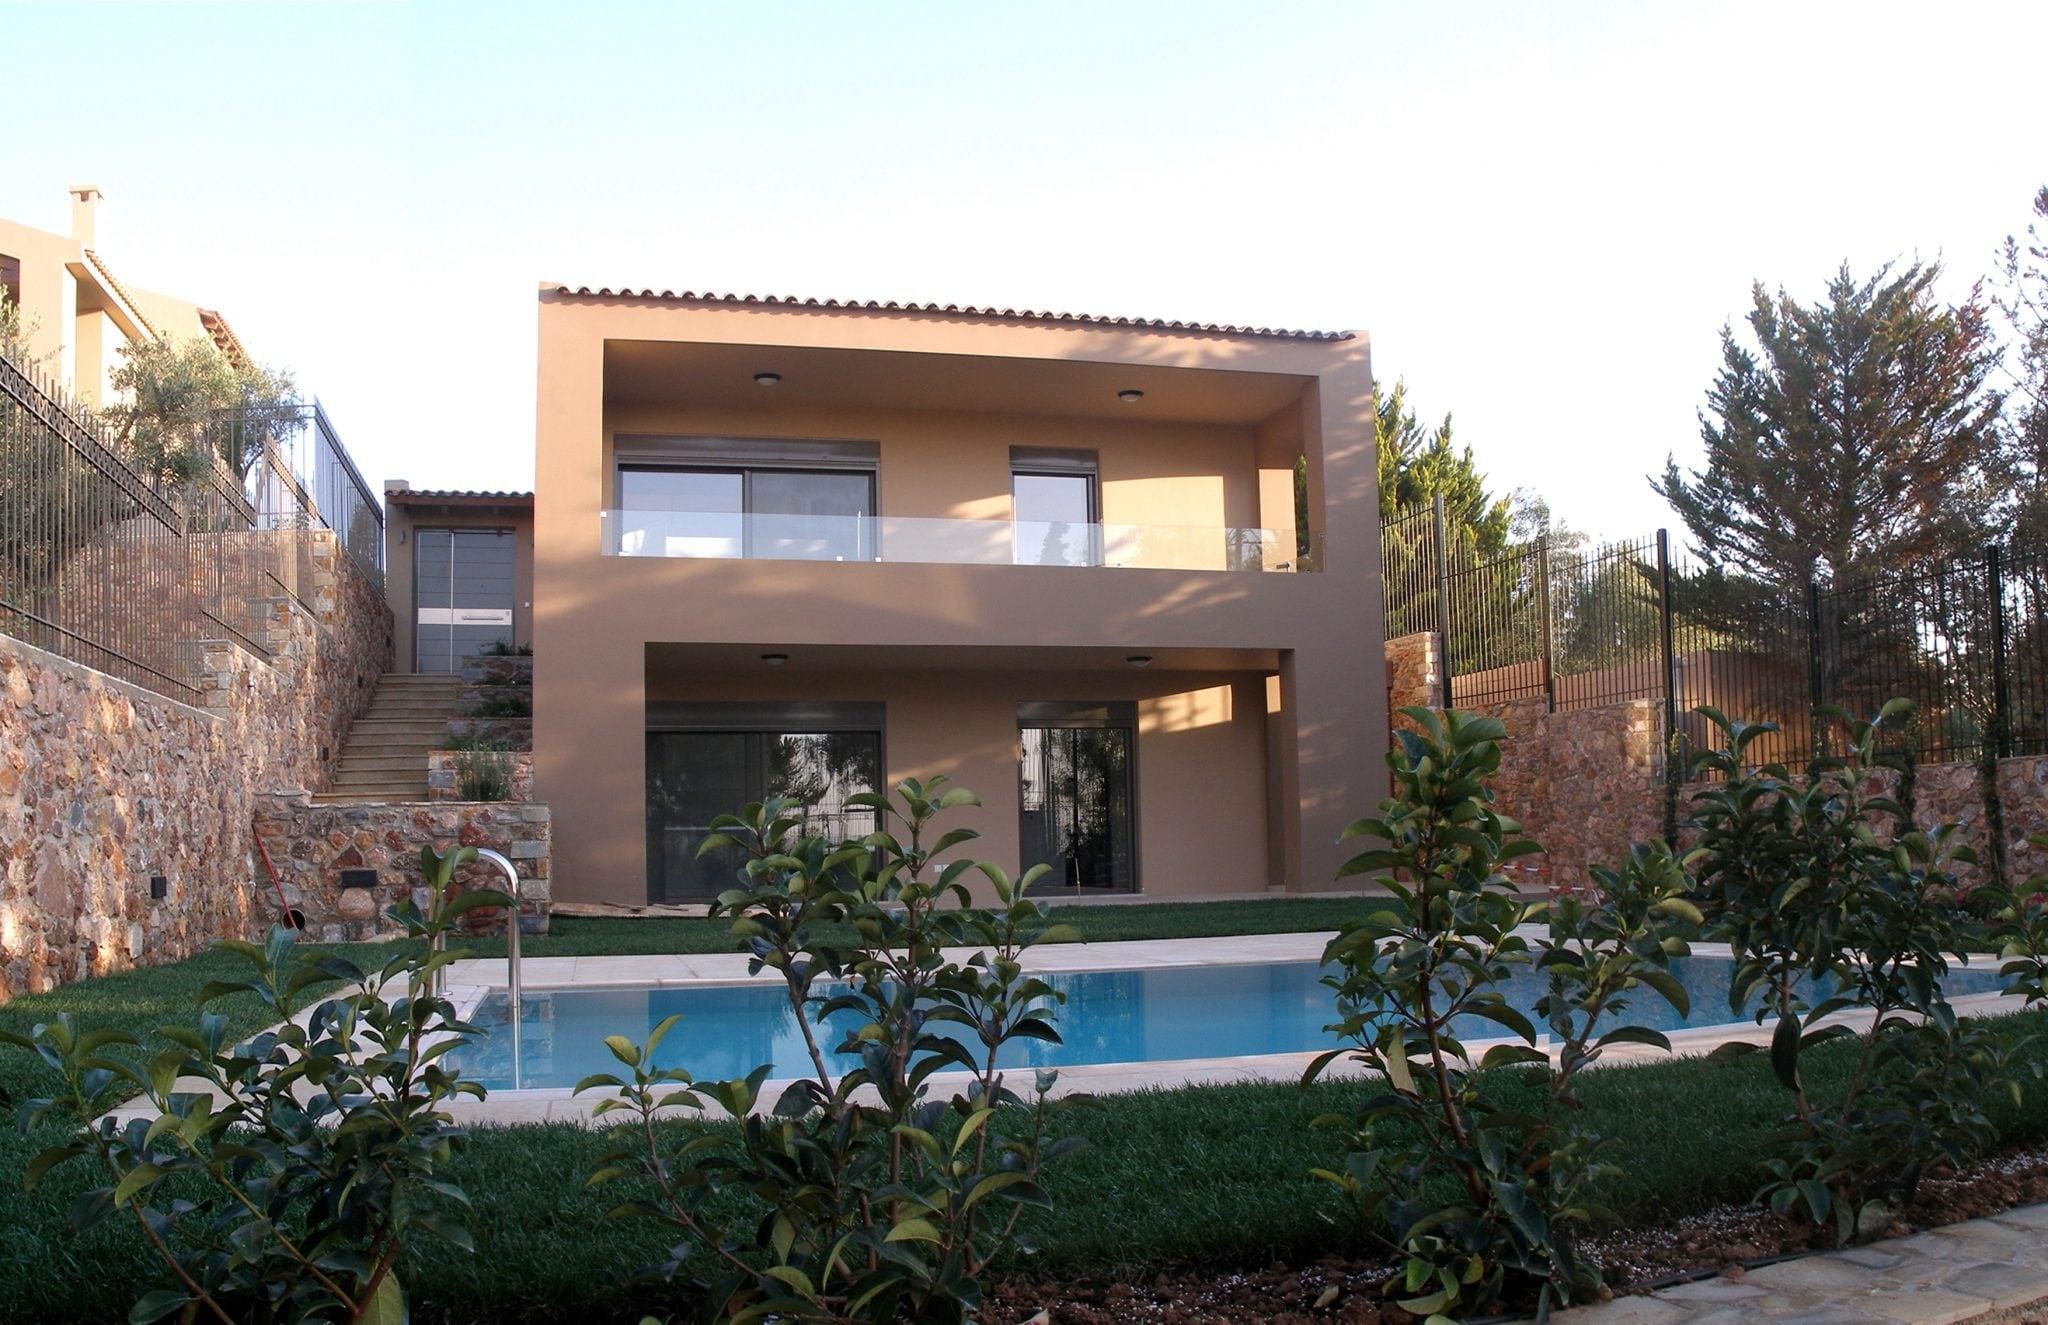 Casa, Paiania - Ref GR-4297